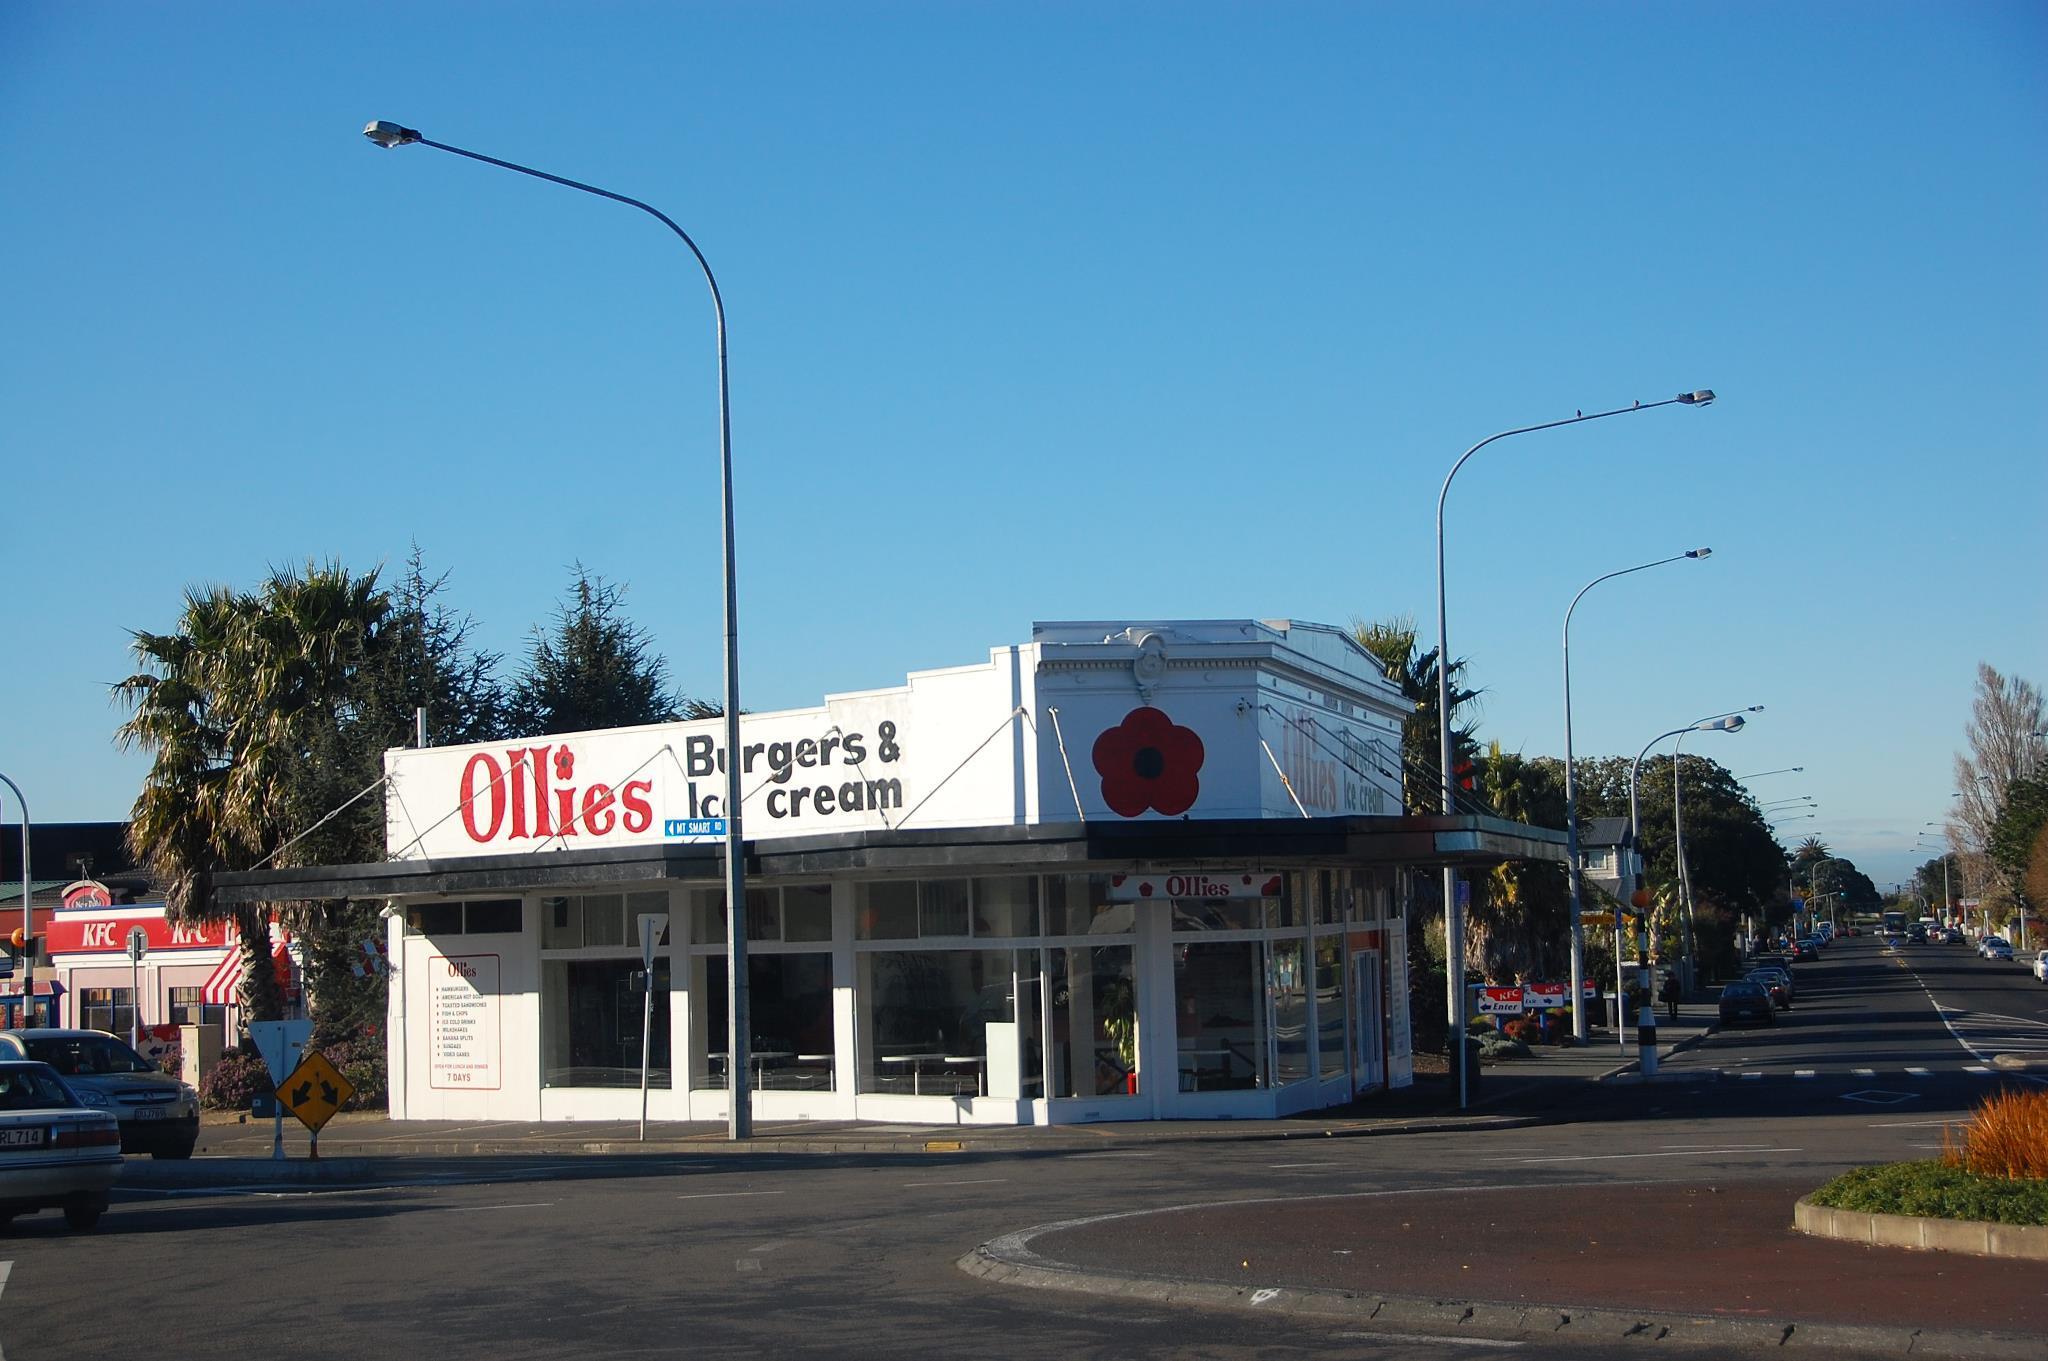 Ollies Burgers & Ice Cream